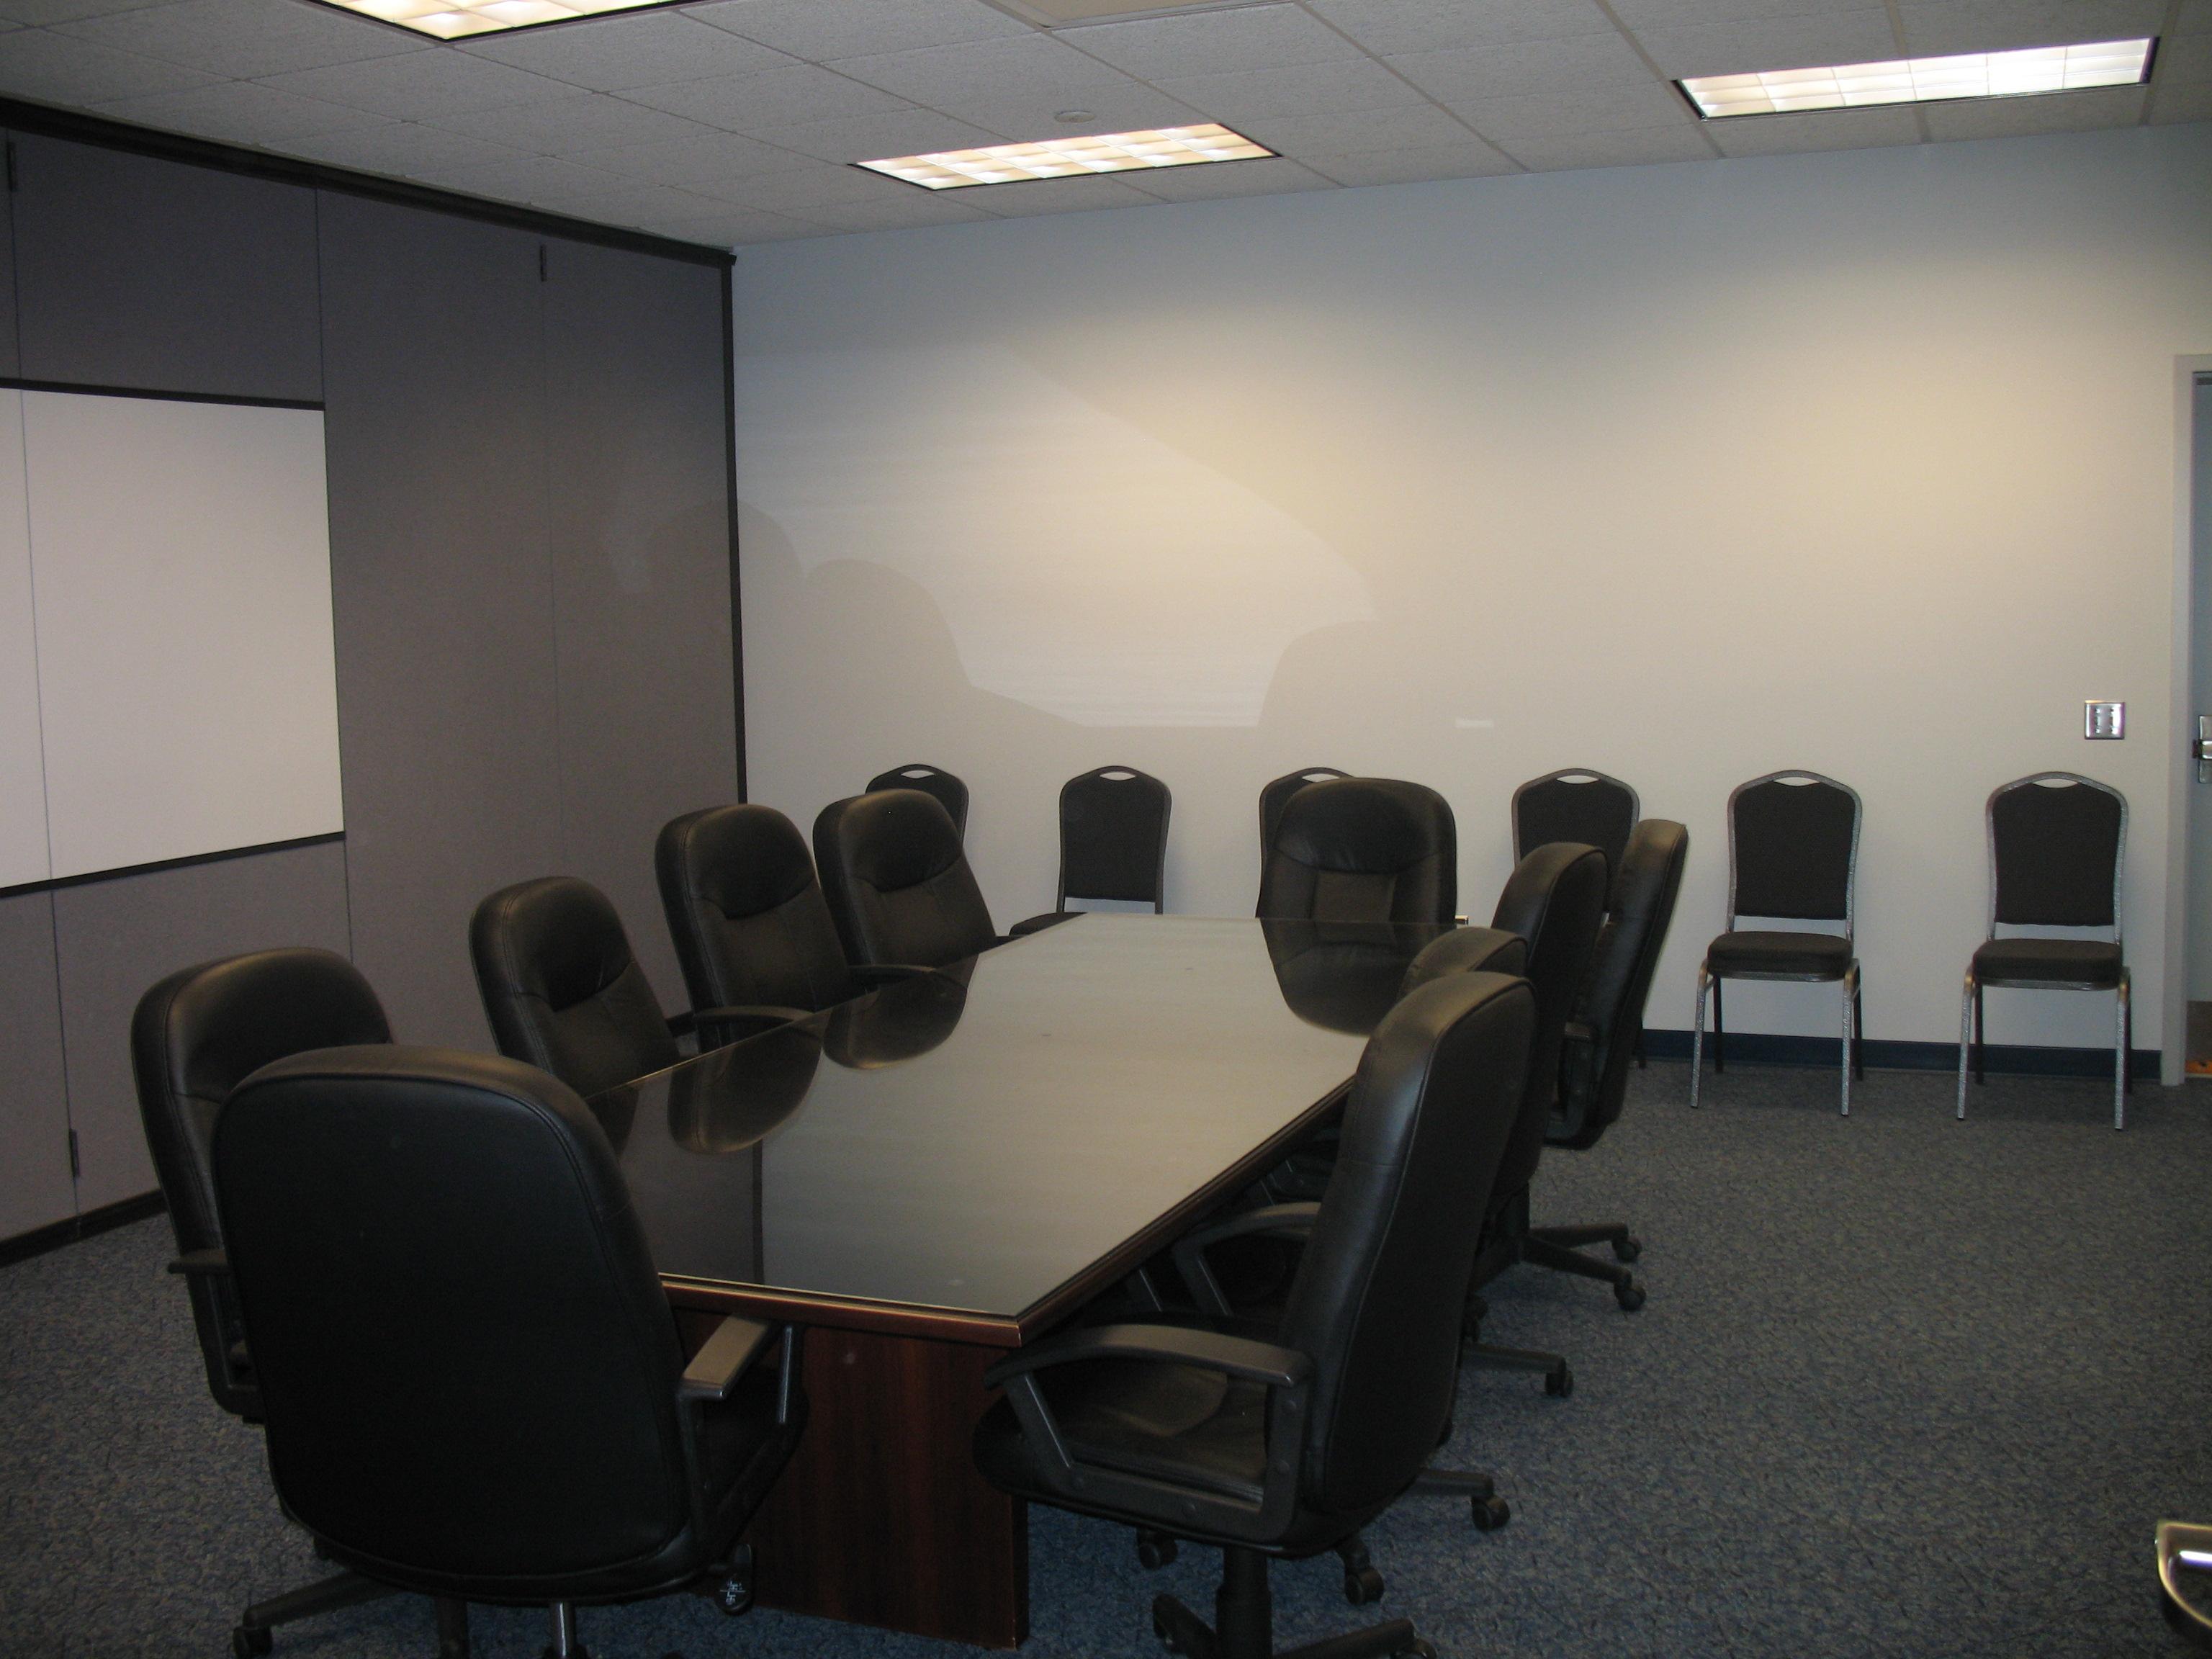 council-bluffs-airport-terminal-conferance-room2